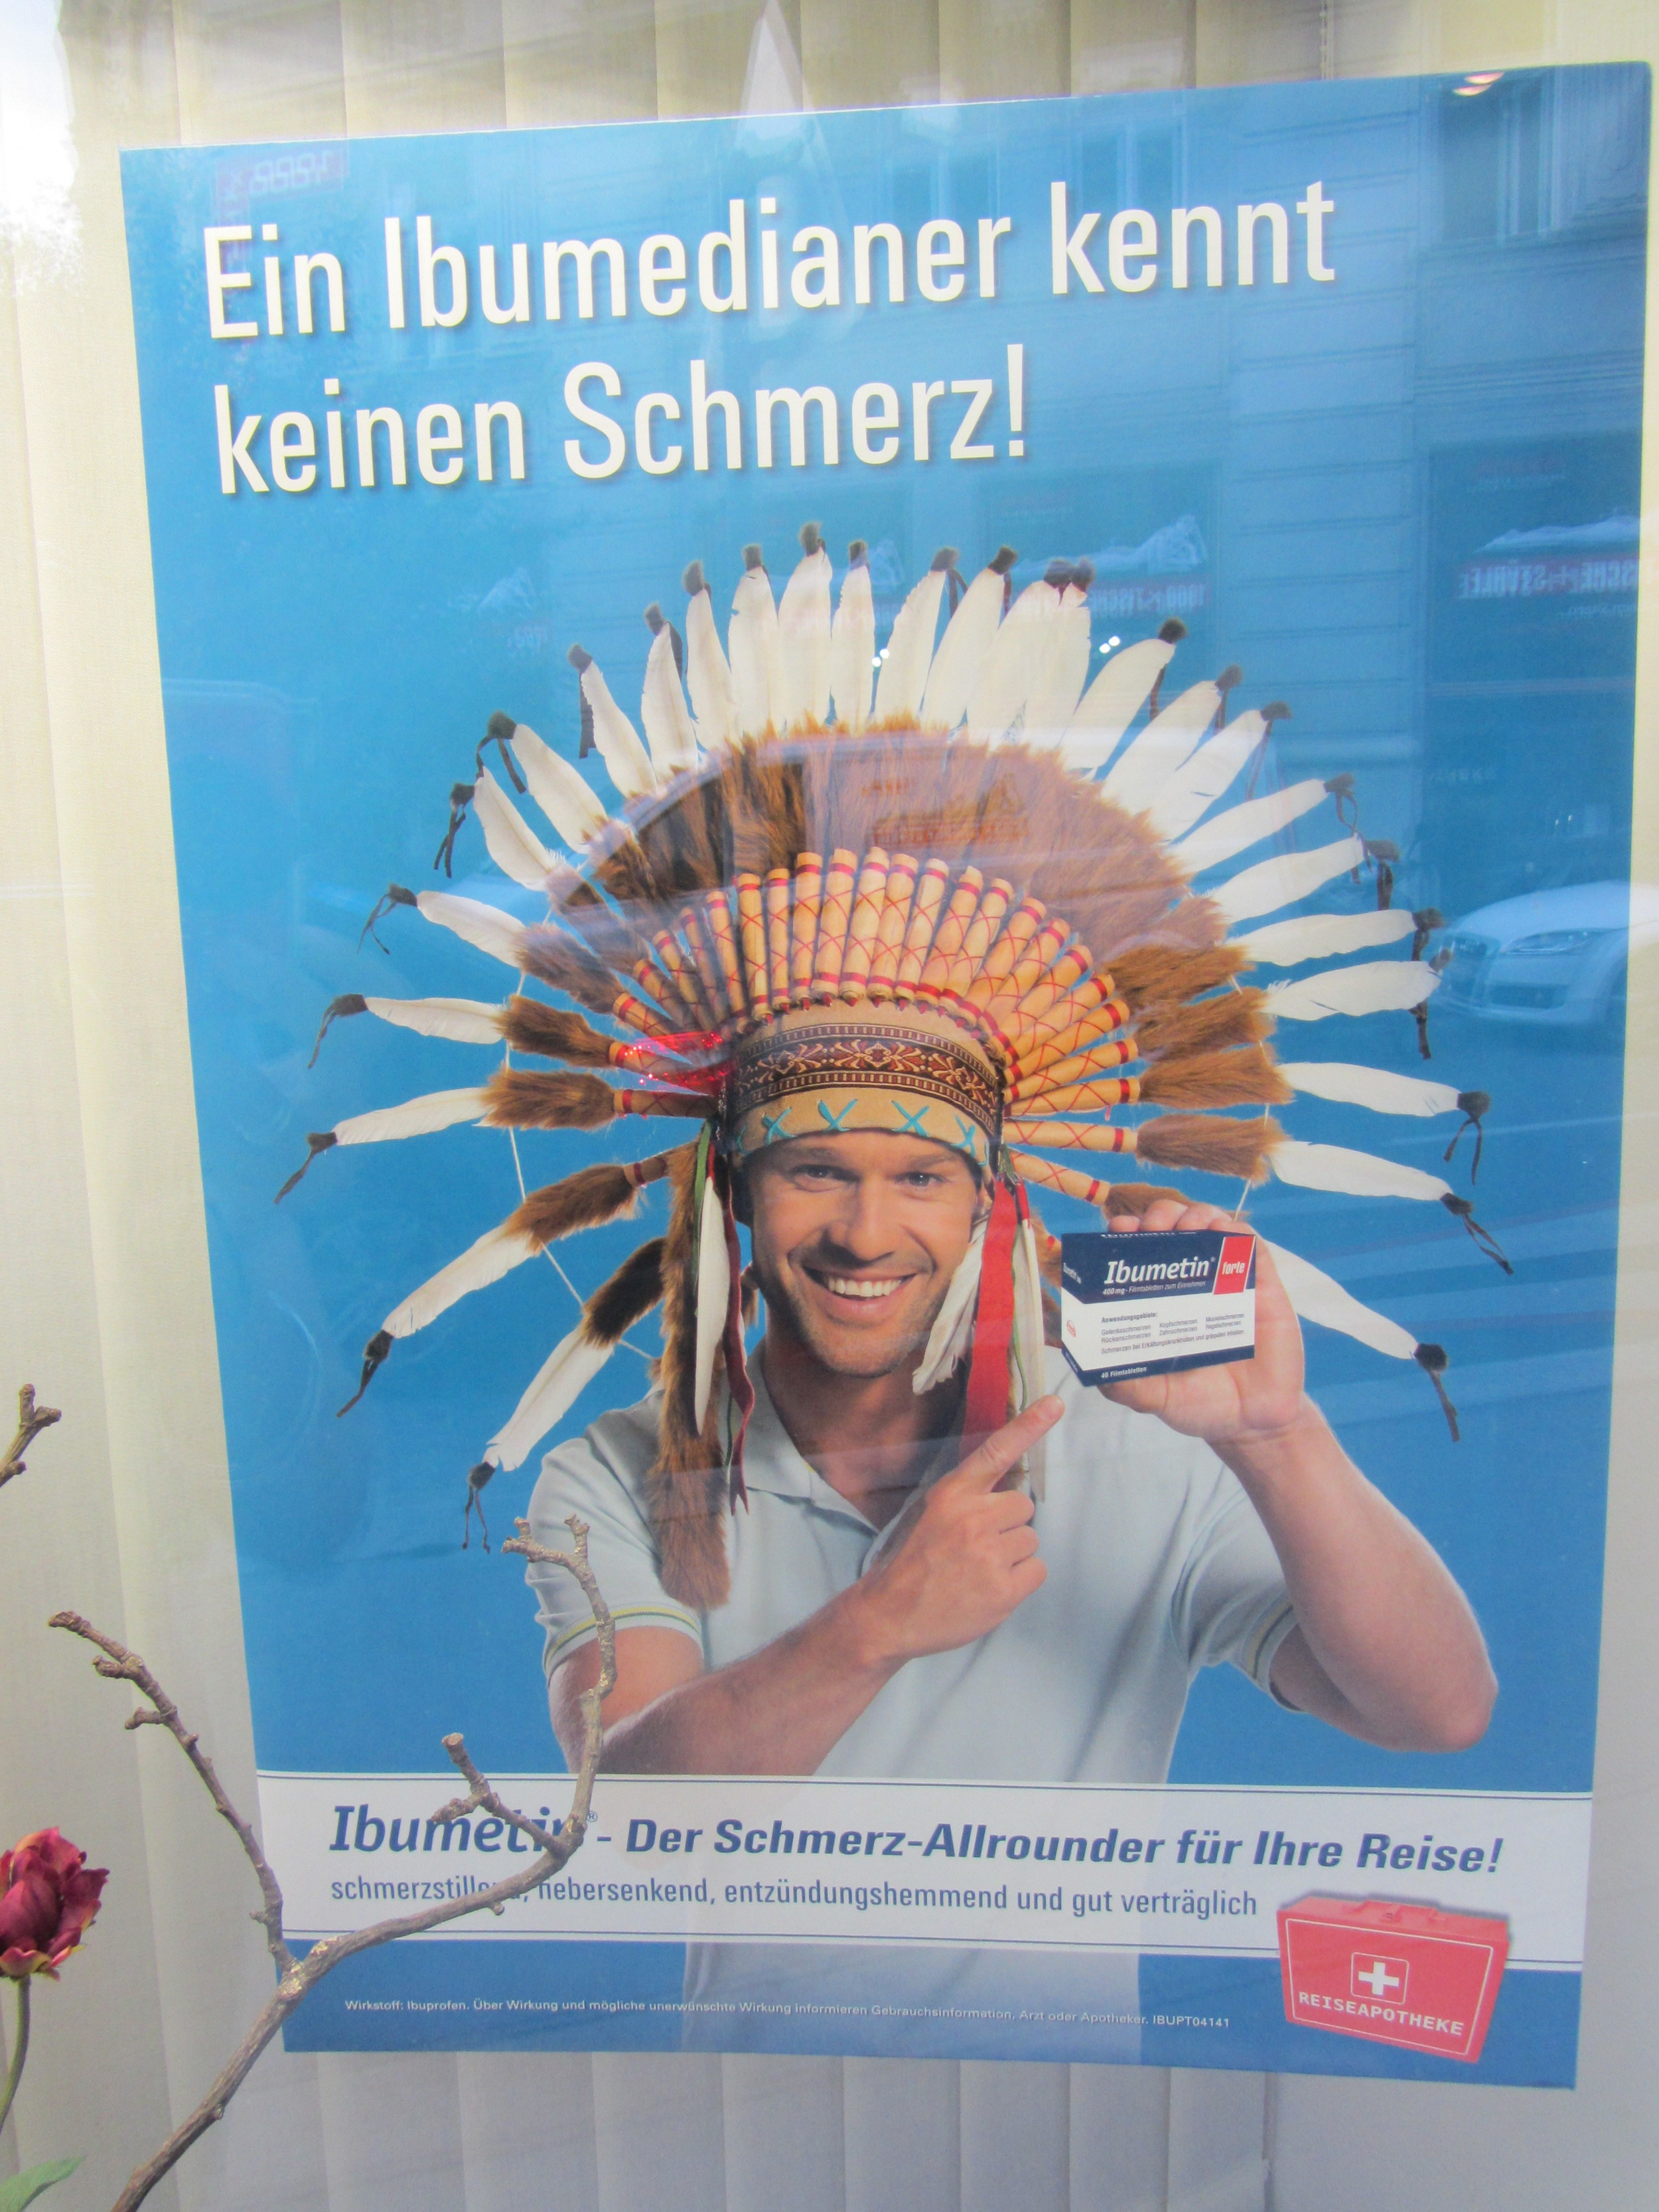 offensive sign in vienna